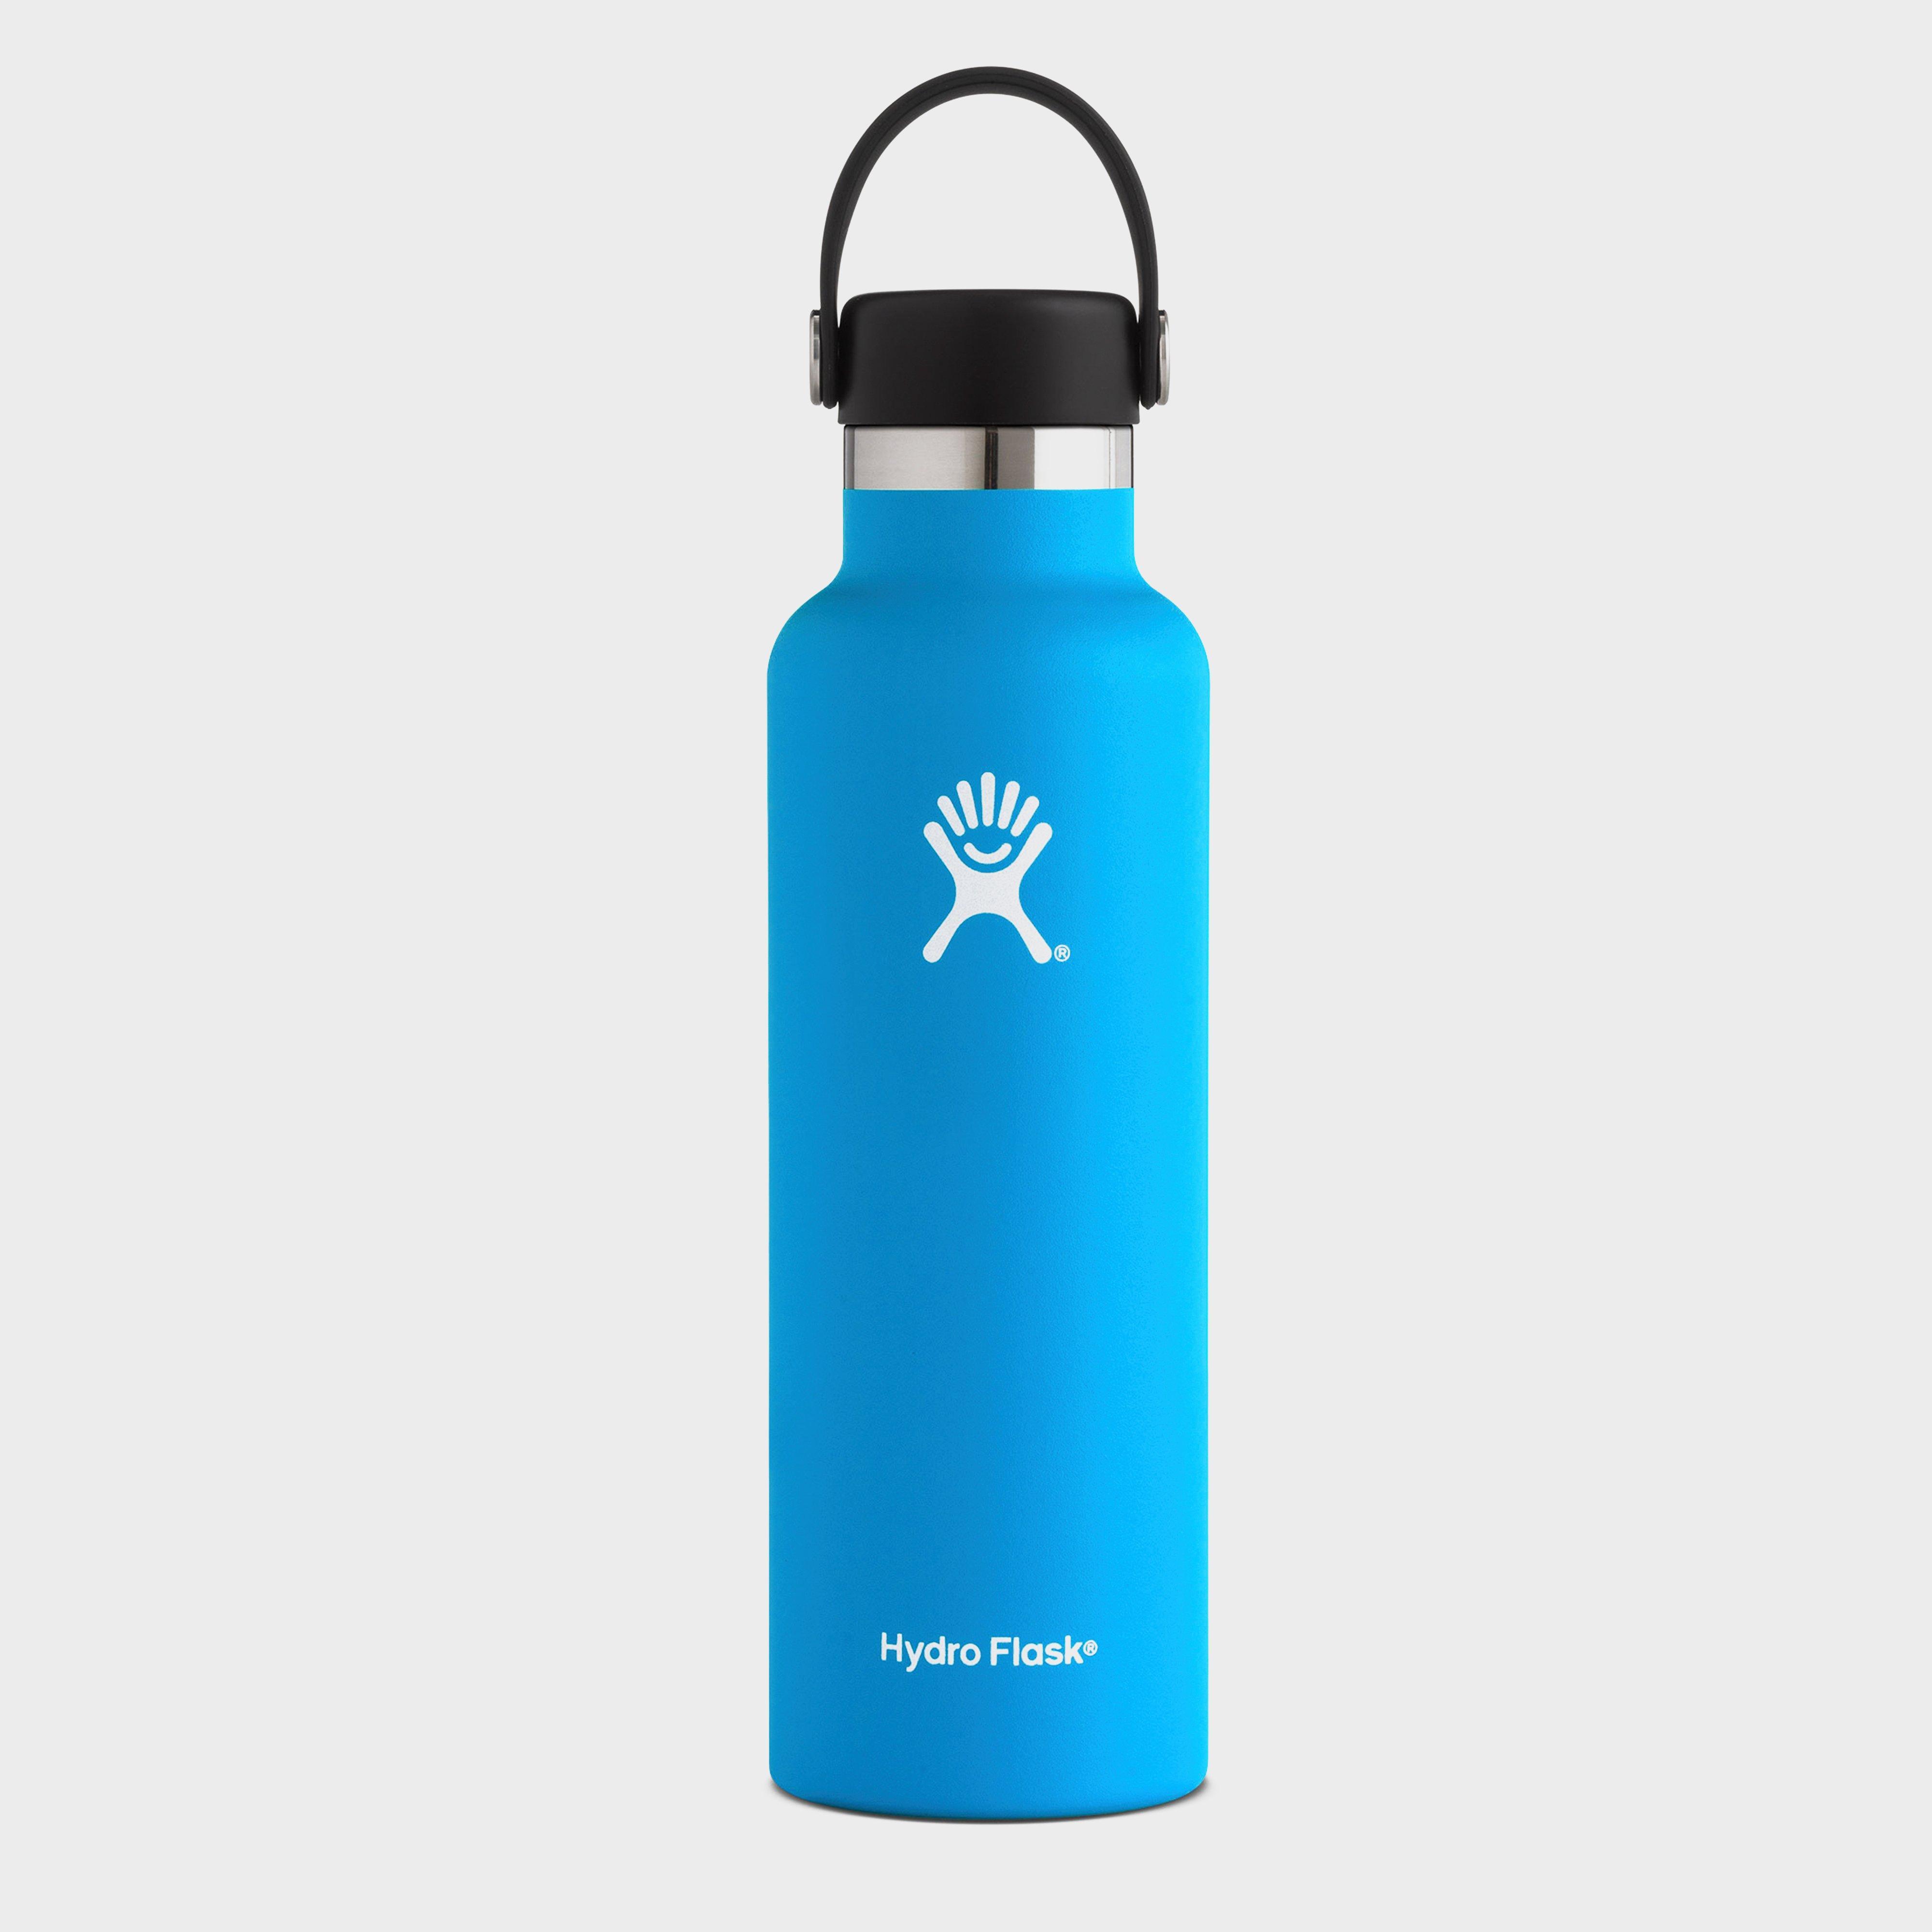 Hydro Flask 21oz Standard Mouth Flask, Blue/Blue